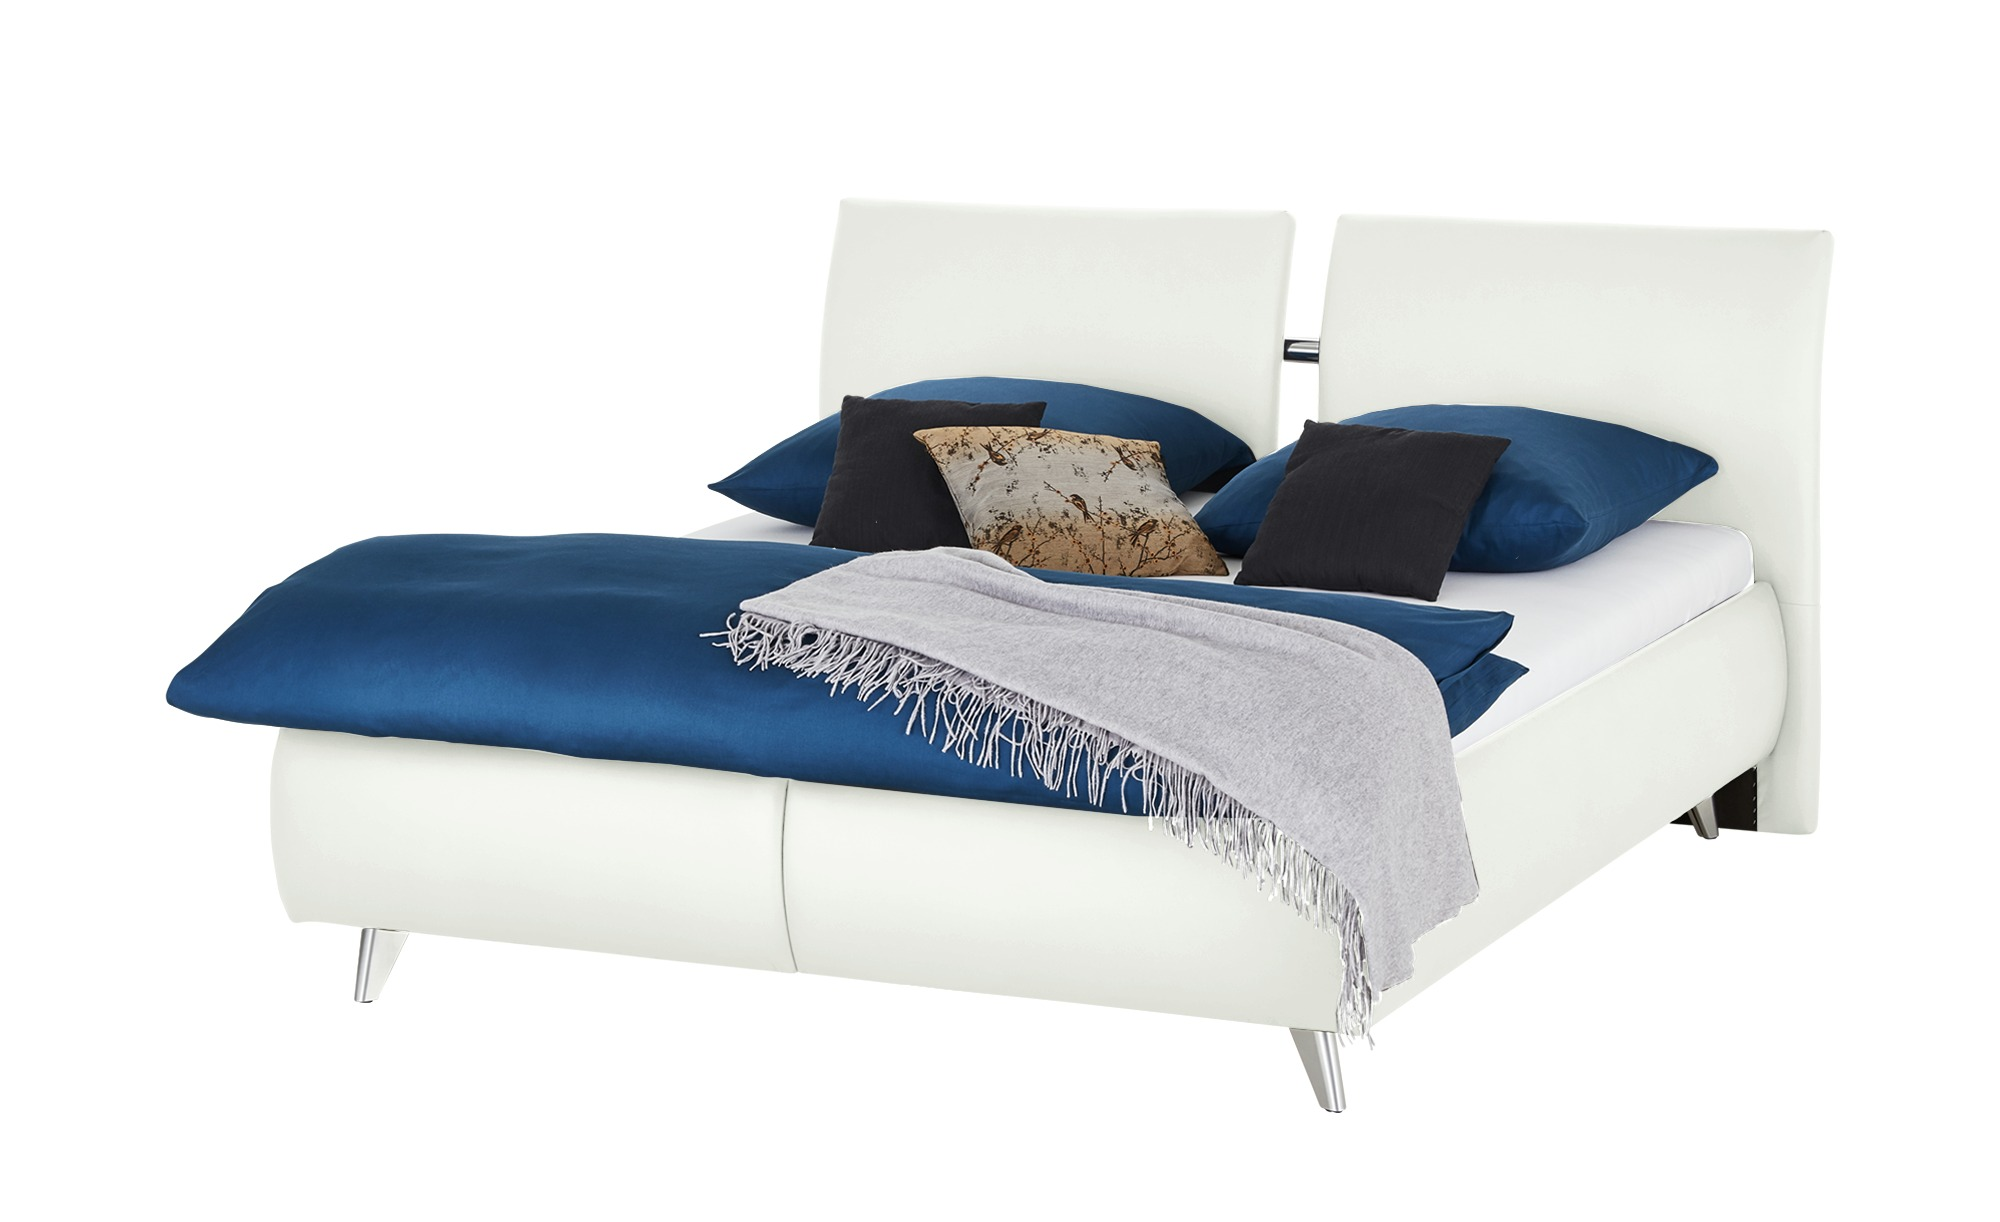 Full Size of Polsterbett 200x220 Polsterbetten Online Kaufen Mbel Suchmaschine Ladendirektde Betten Bett Wohnzimmer Polsterbett 200x220